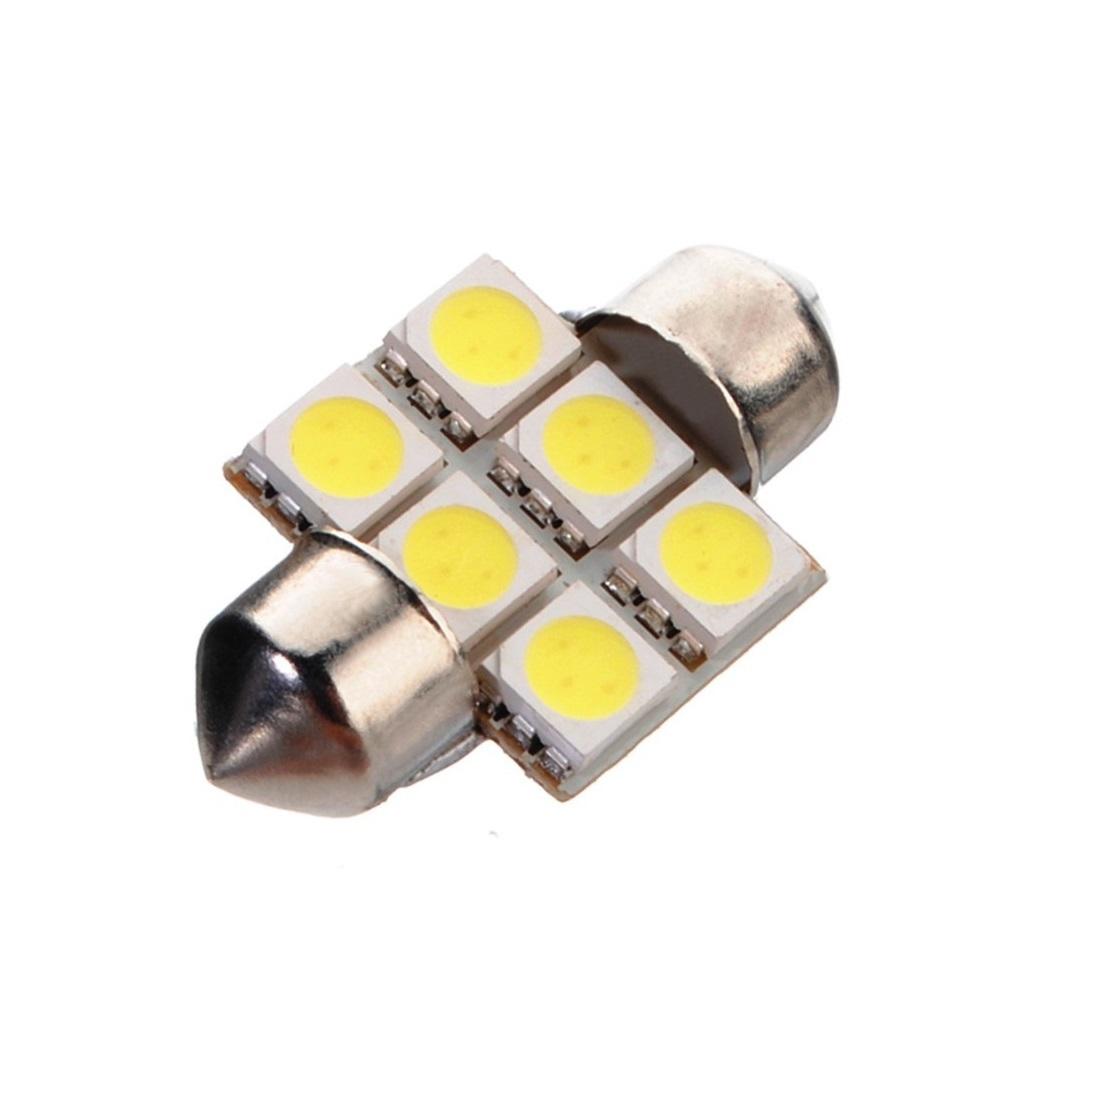 Лампа светодиодная C5W / SV8,5-8 / 12V 6SMD 31мм открытая бел